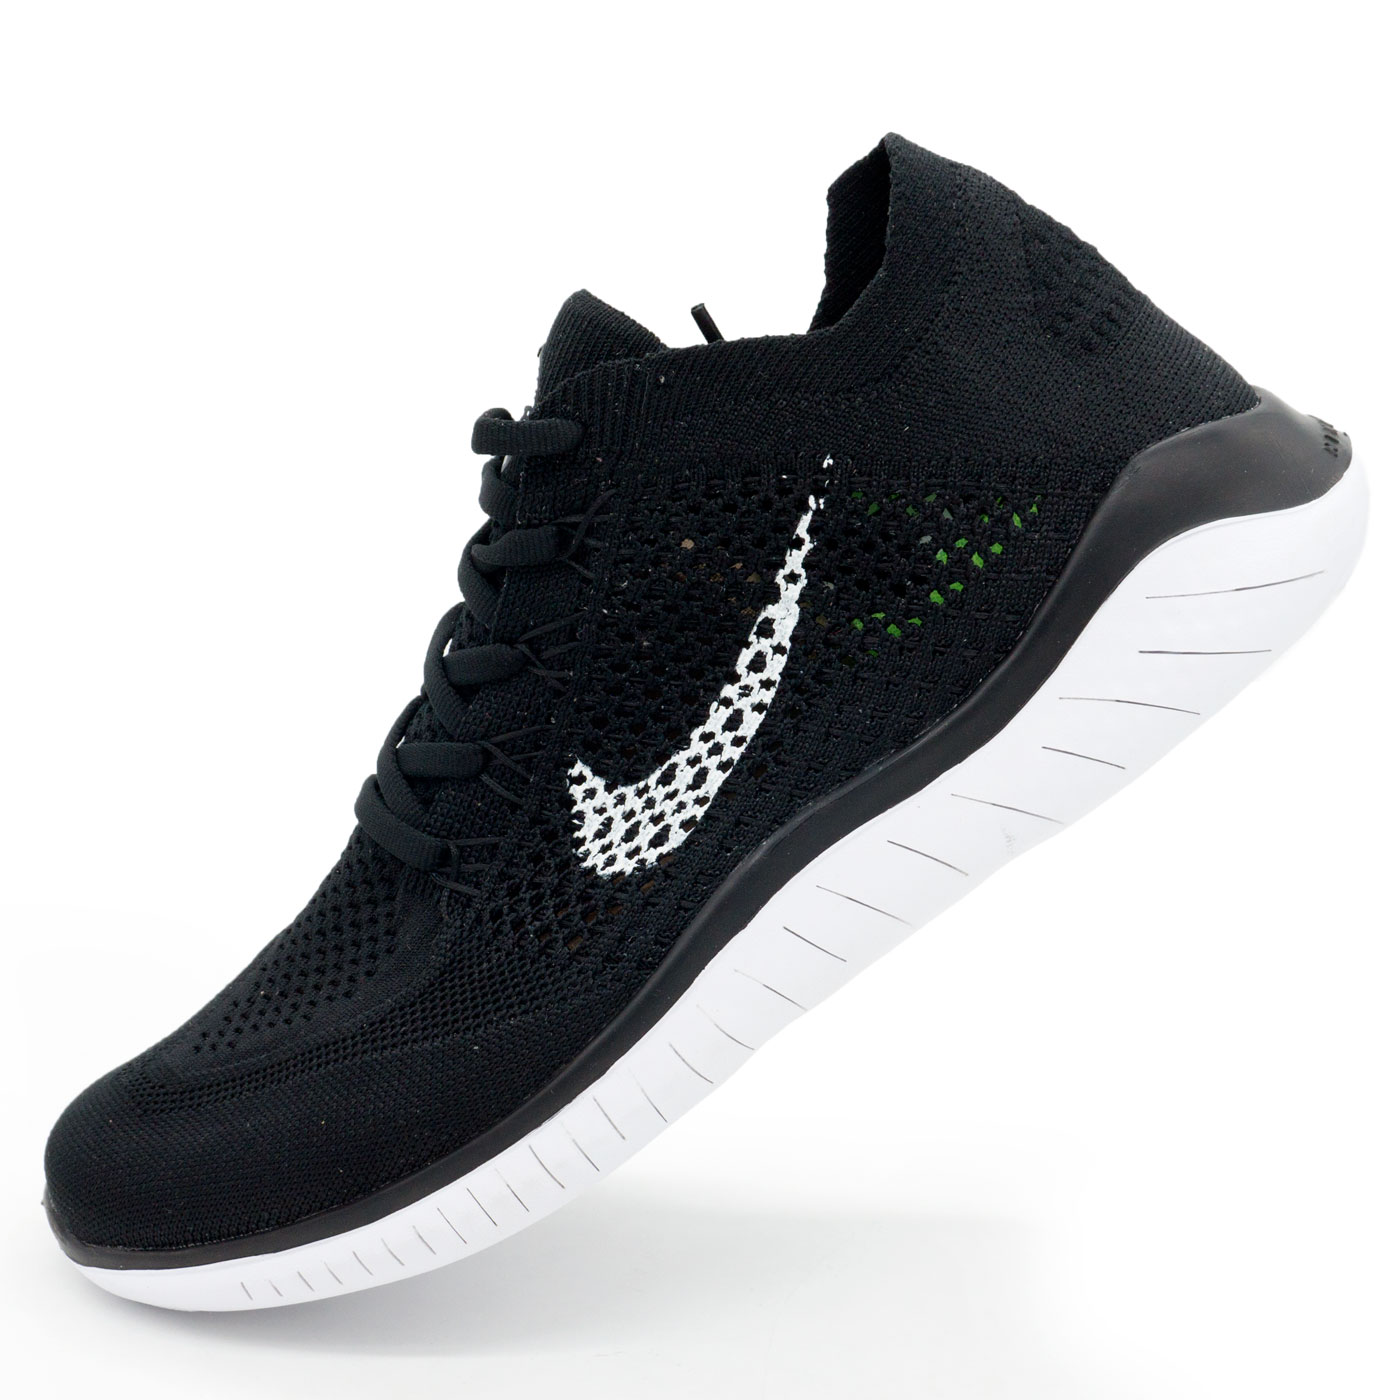 фото main Кроссовки для бега Nike Free Run Flyknit Найк Фри Ран, черно-белые main